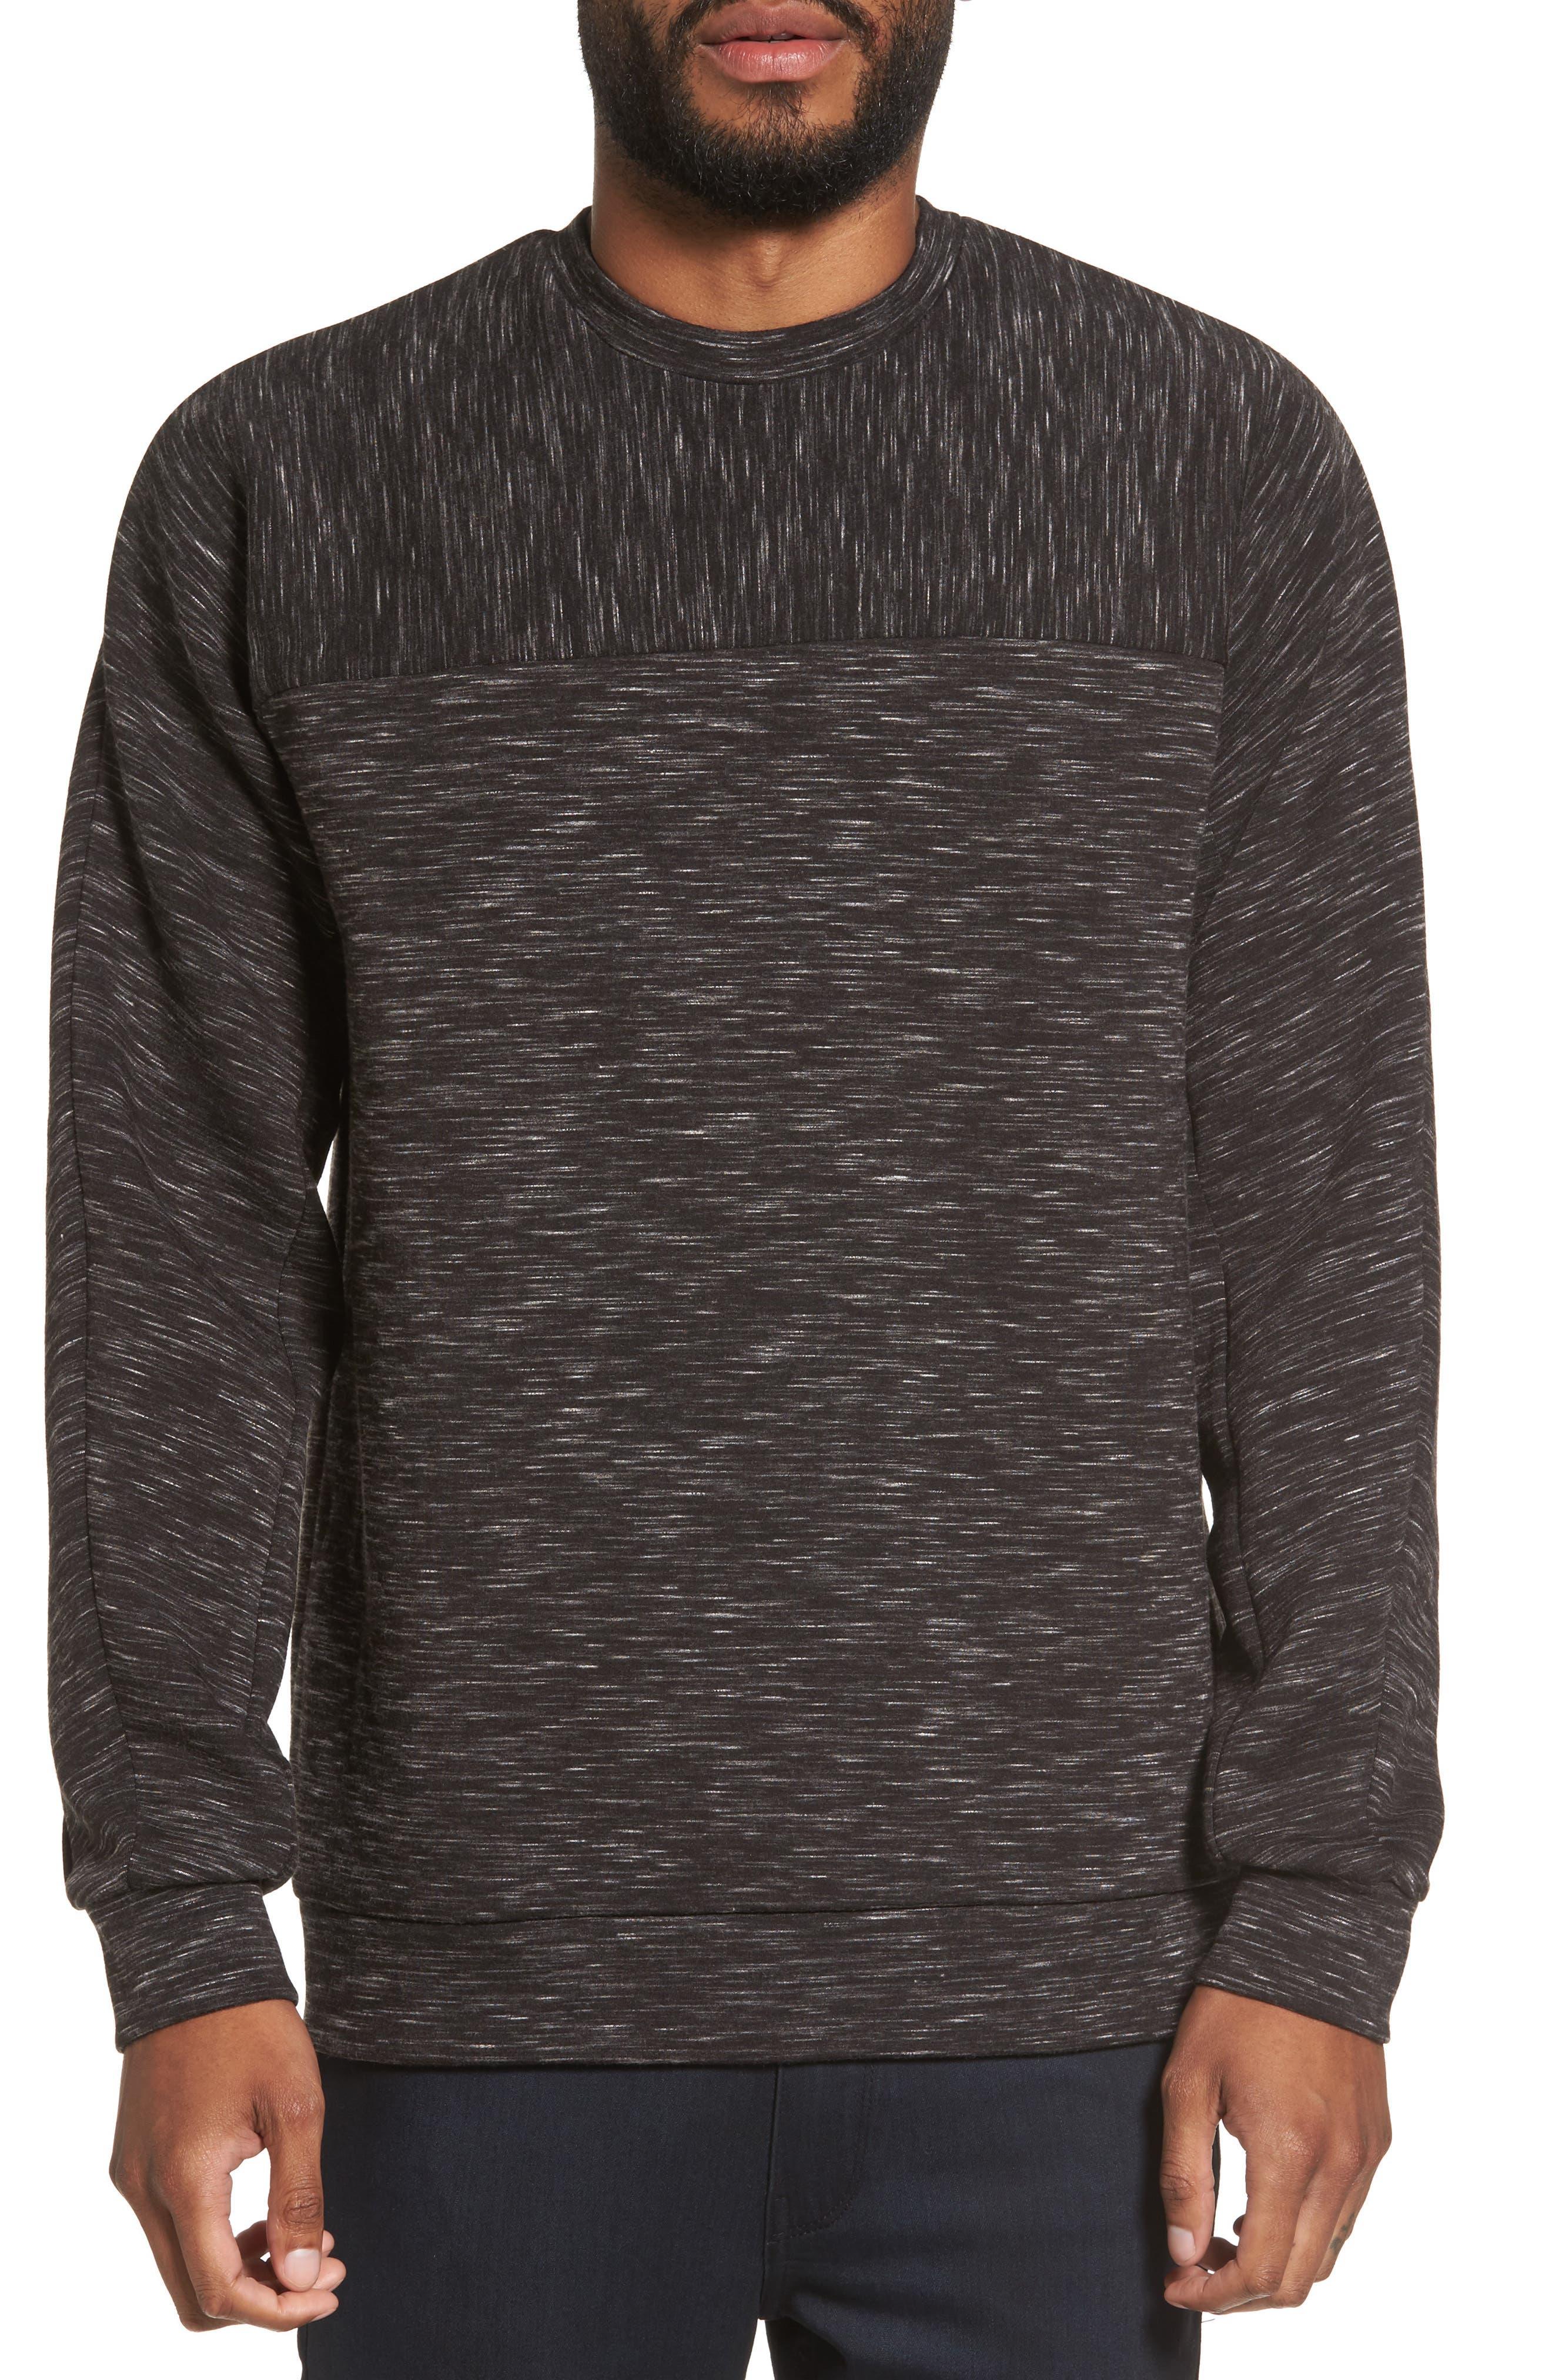 Alternate Image 1 Selected - Calibrate Side Zip Crewneck Sweatshirt